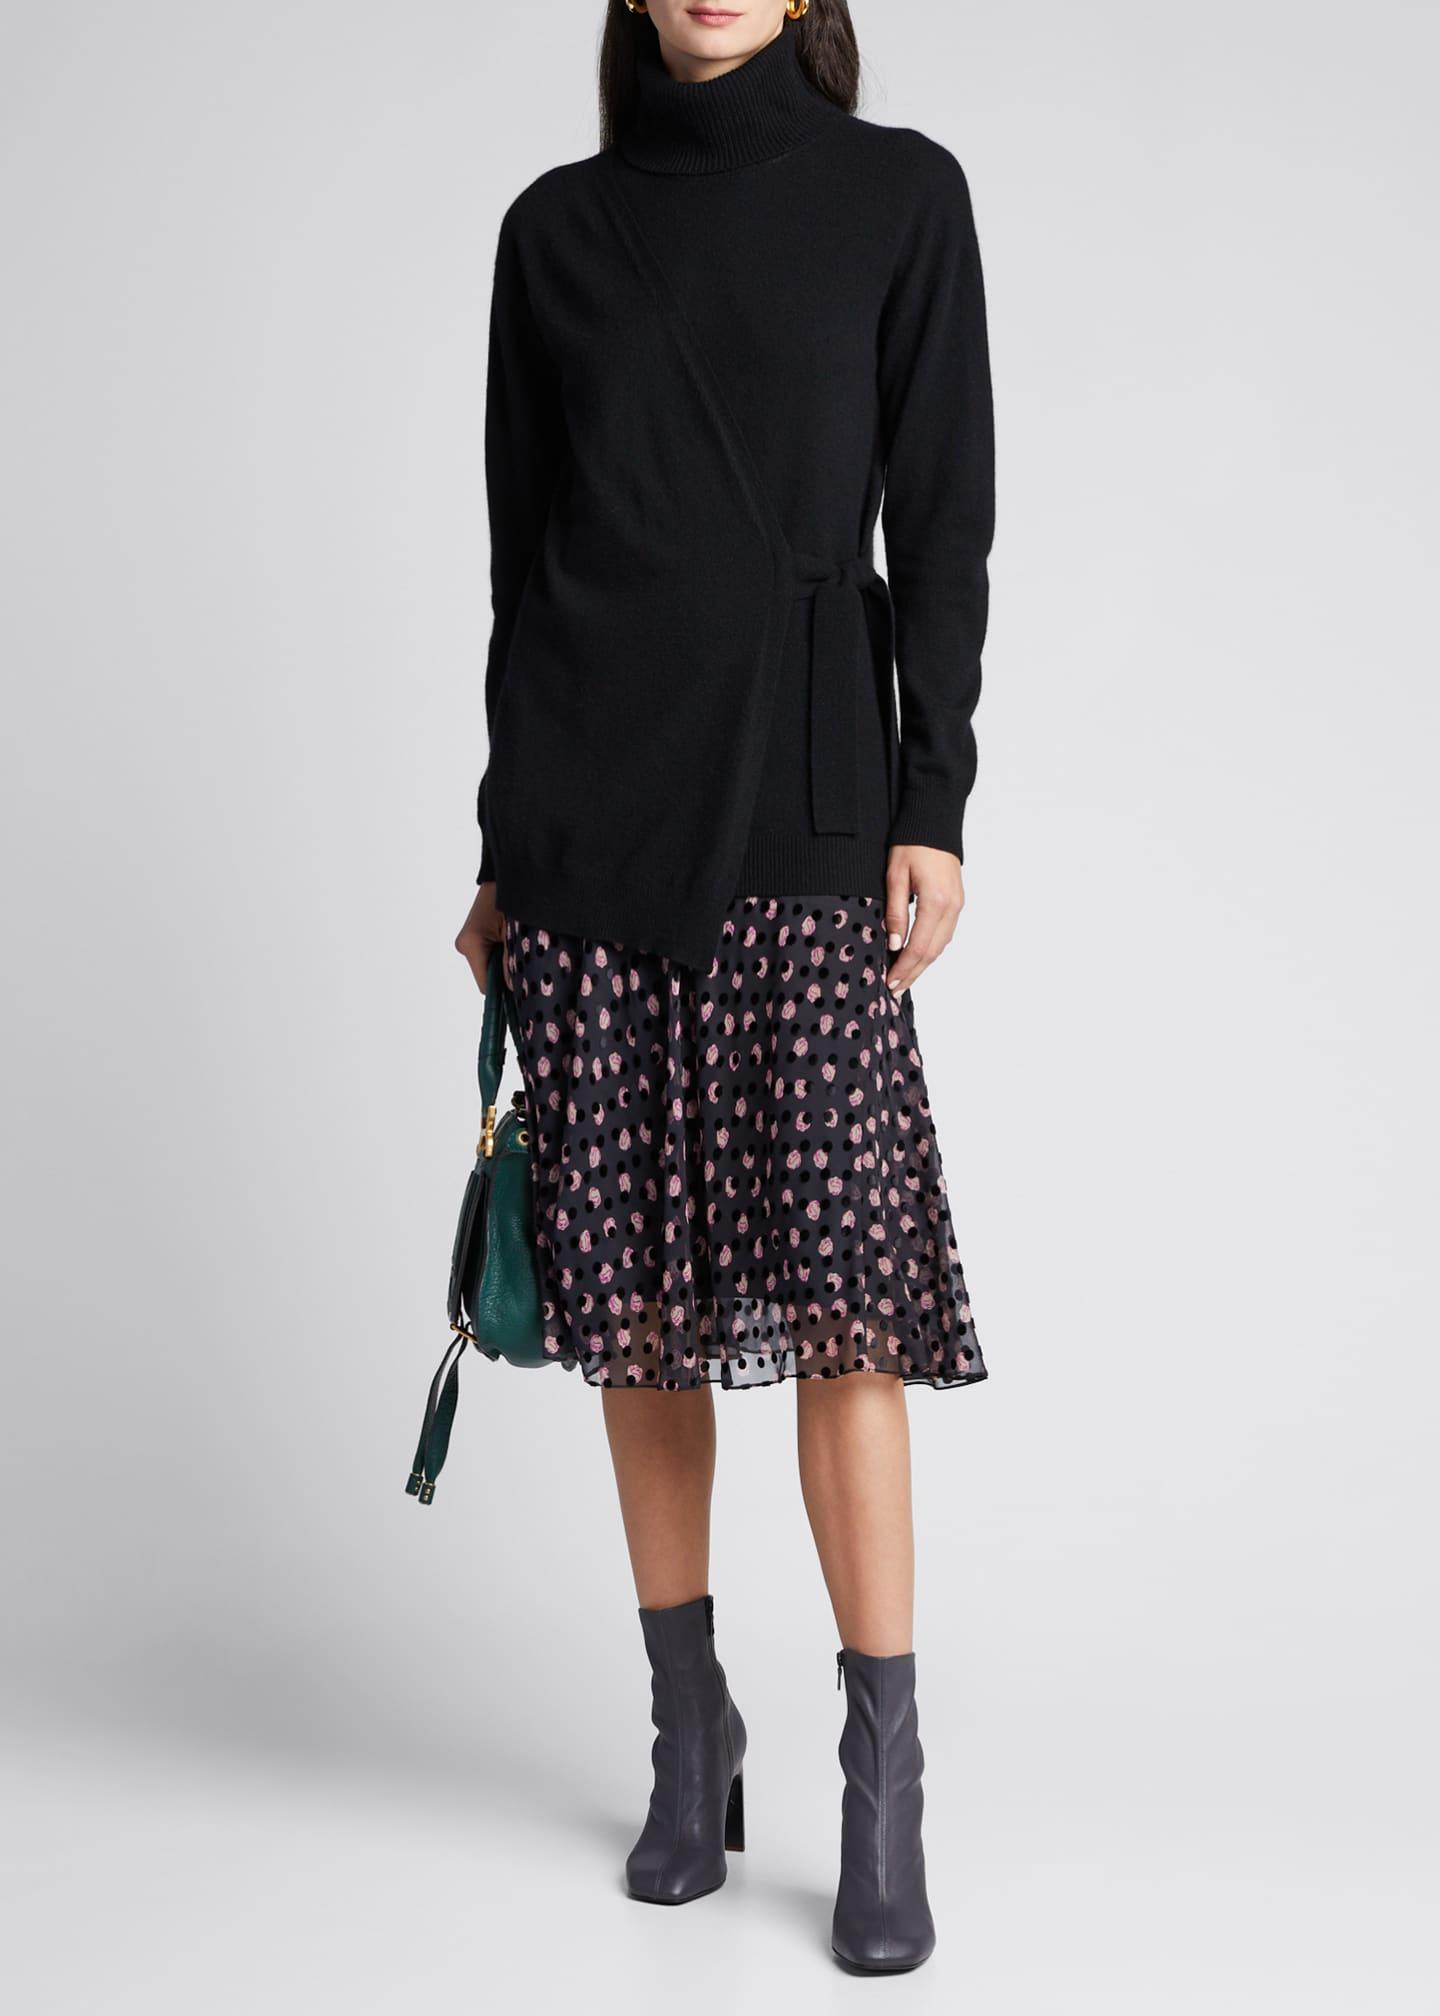 Diane von Furstenberg Pomona Faux-Wrap Turtleneck Sweater